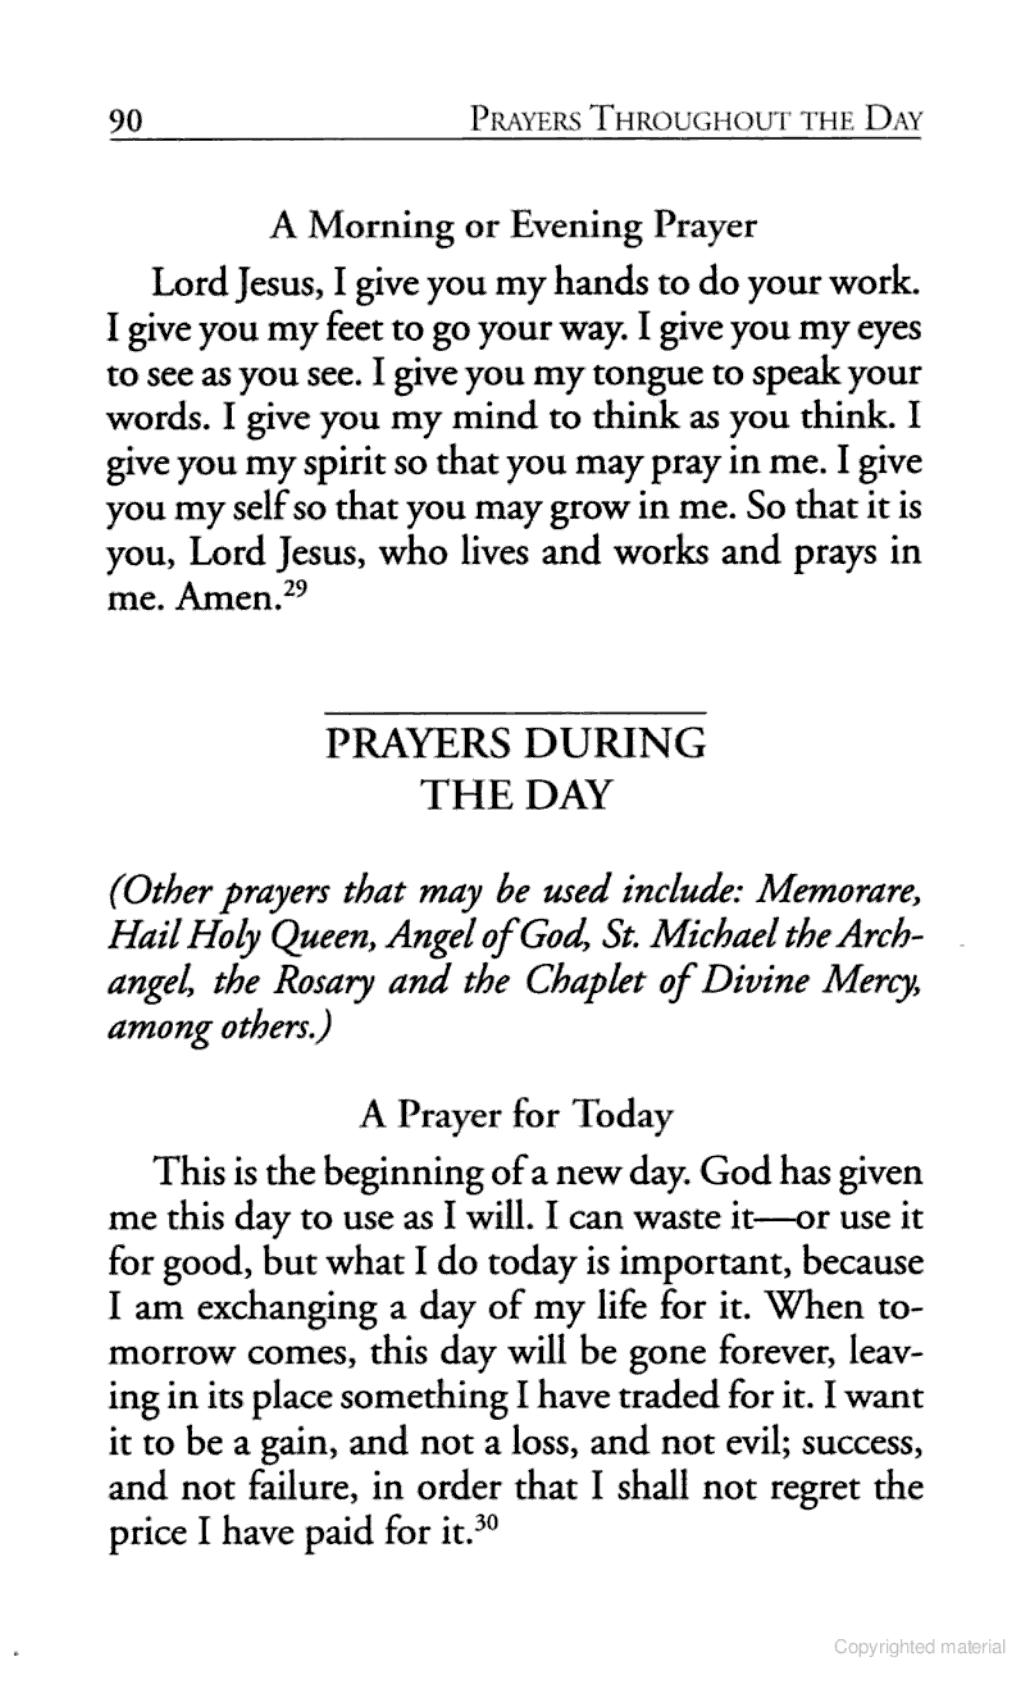 catholic family prayer book lord jesus i give you my hands to catholic family prayer book lord jesus i give you my hands to